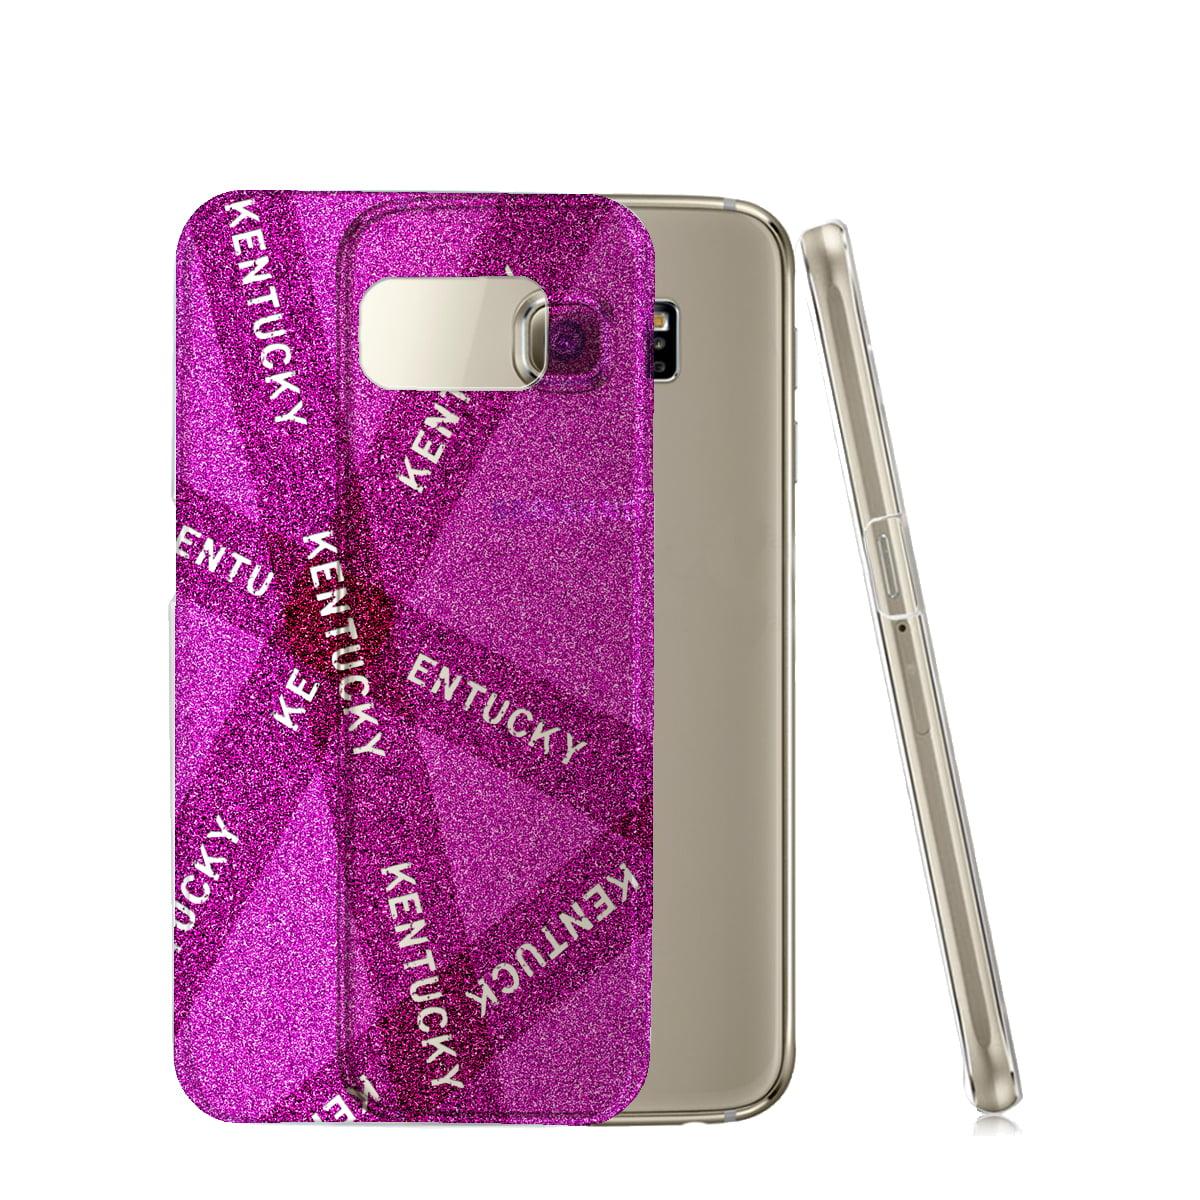 KuzmarK™ Samsung Galaxy S6 Edge Clear Cover Case - Kentucky Pink Pride